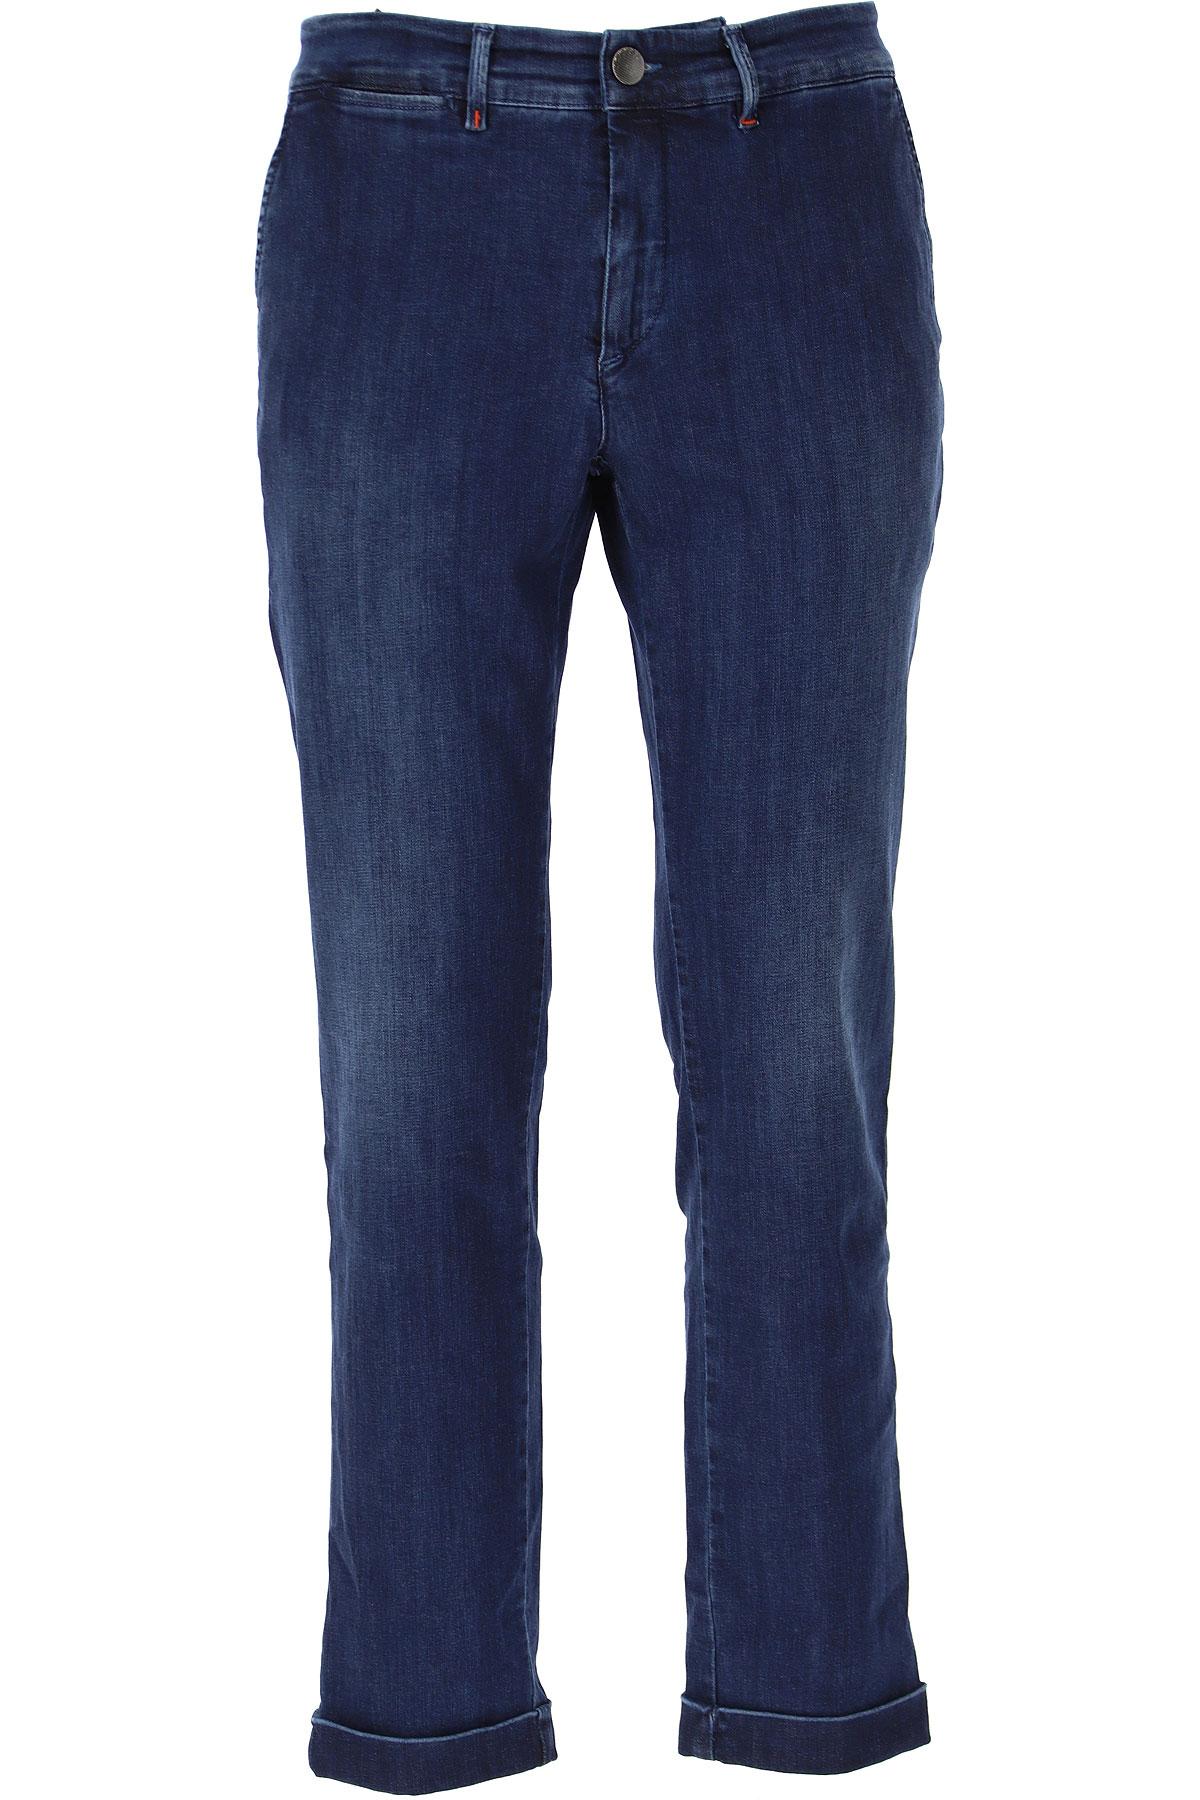 Jeckerson Jeans On Sale, Blu Denim, Cotton, 2019, 29 30 31 32 33 34 35 36 38 40